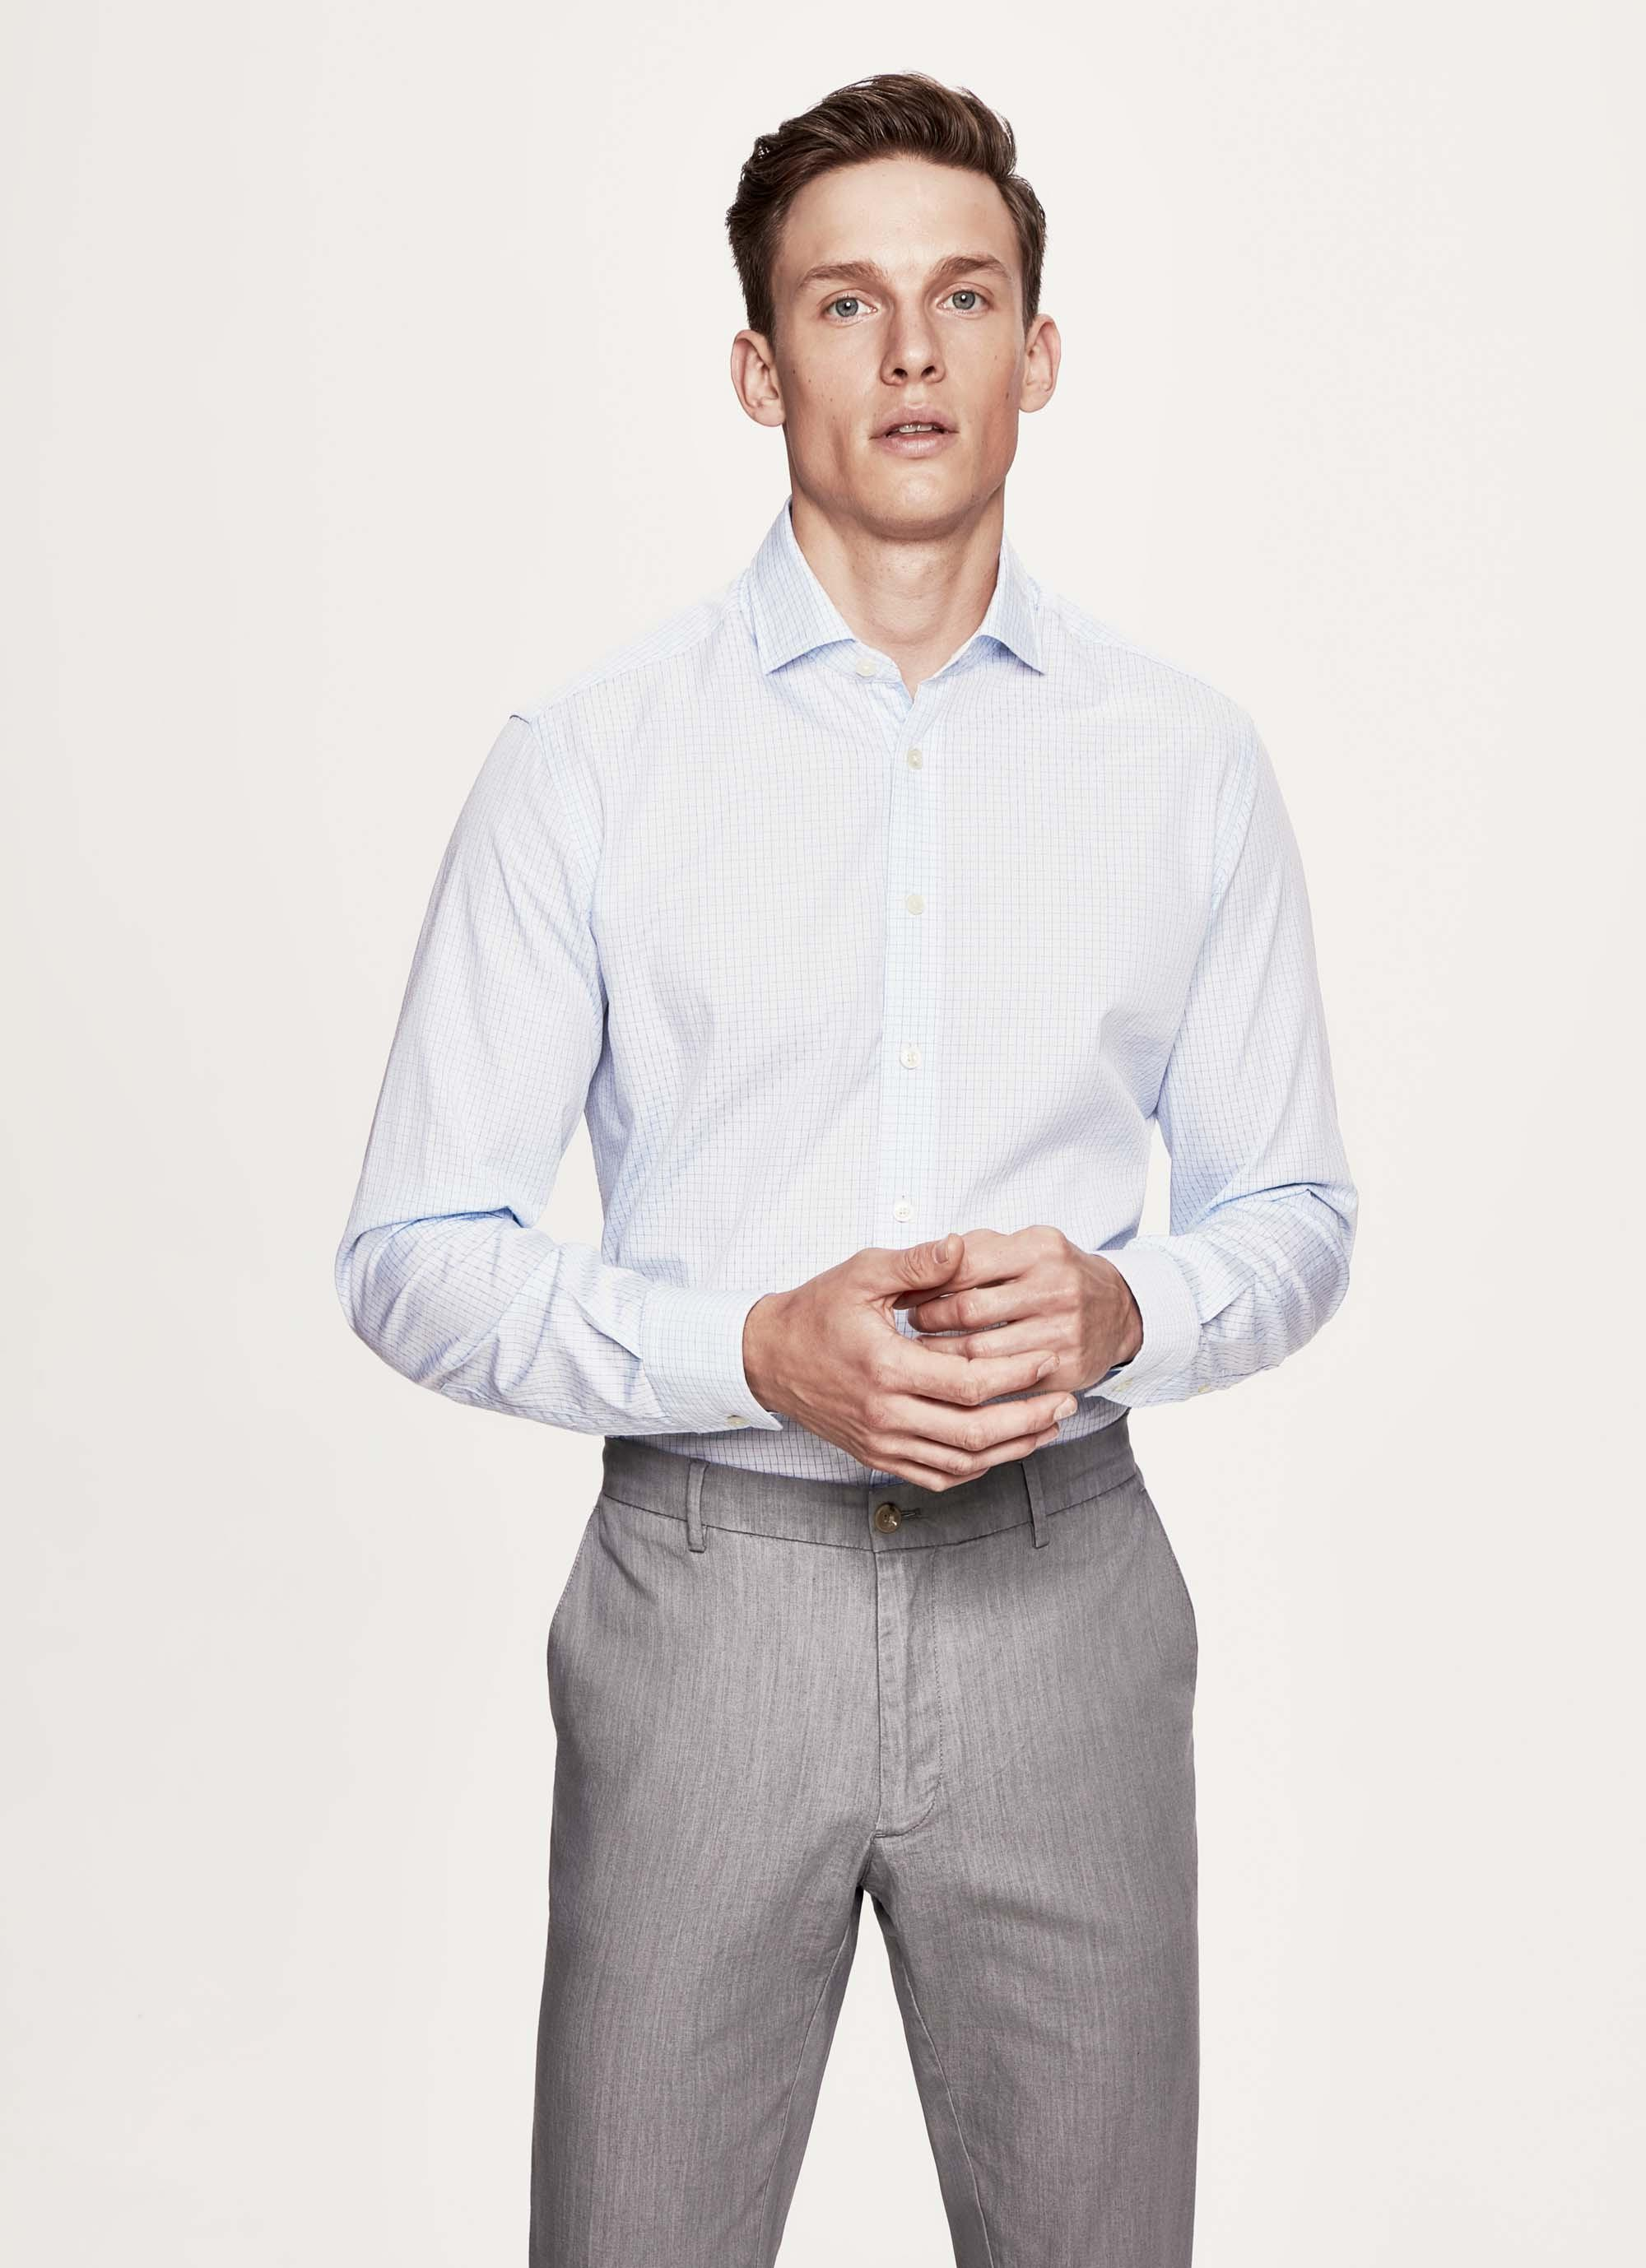 Hackett Graph Check Multi Trim Cotton Shirt in Blue for Men - Lyst bc80002f2155c